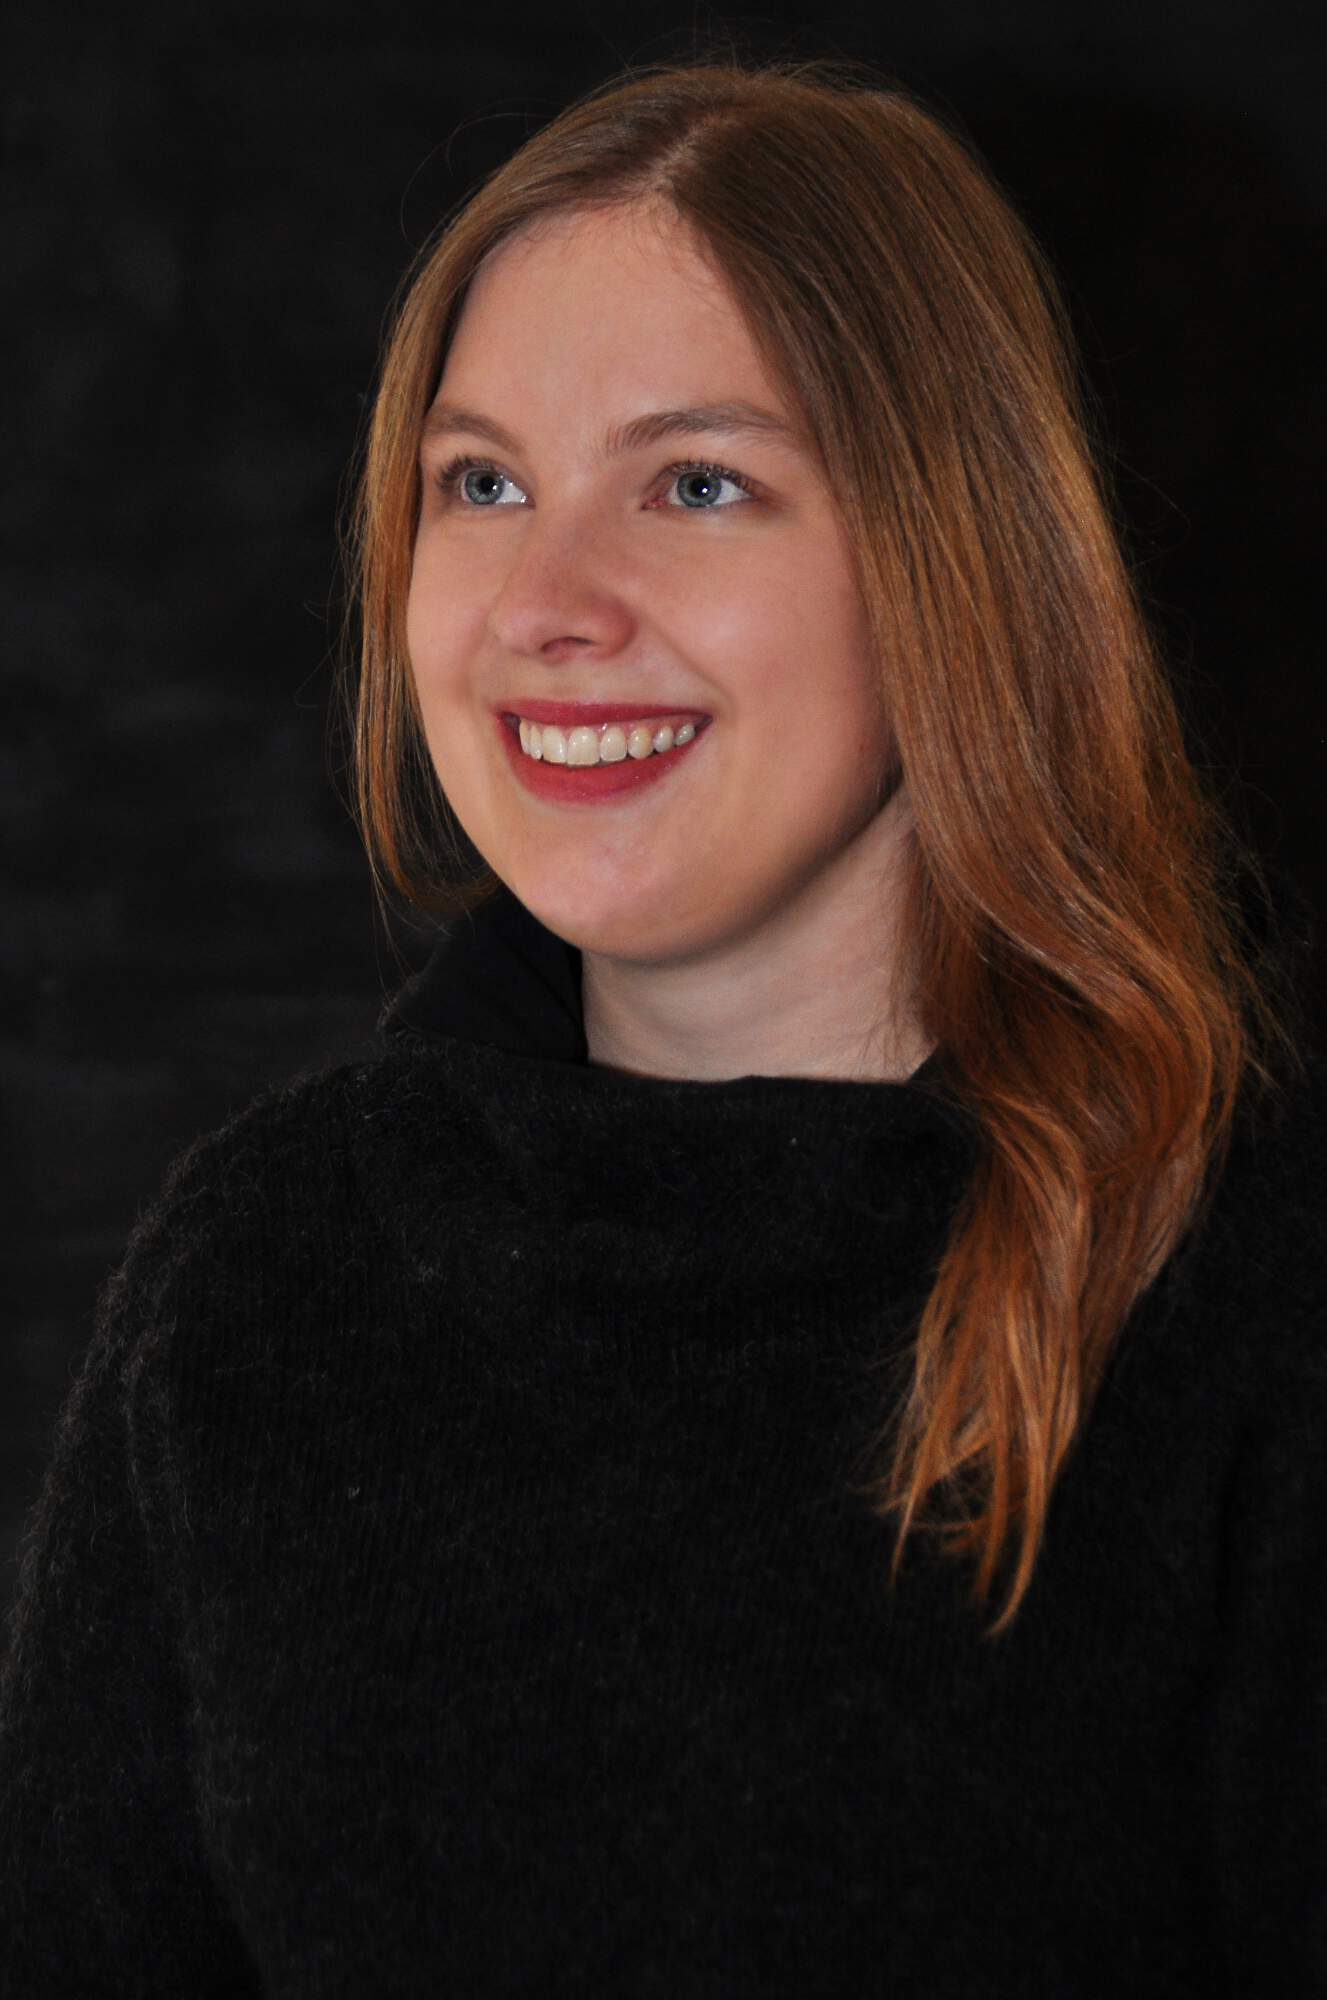 Portrait of Lisa (1)